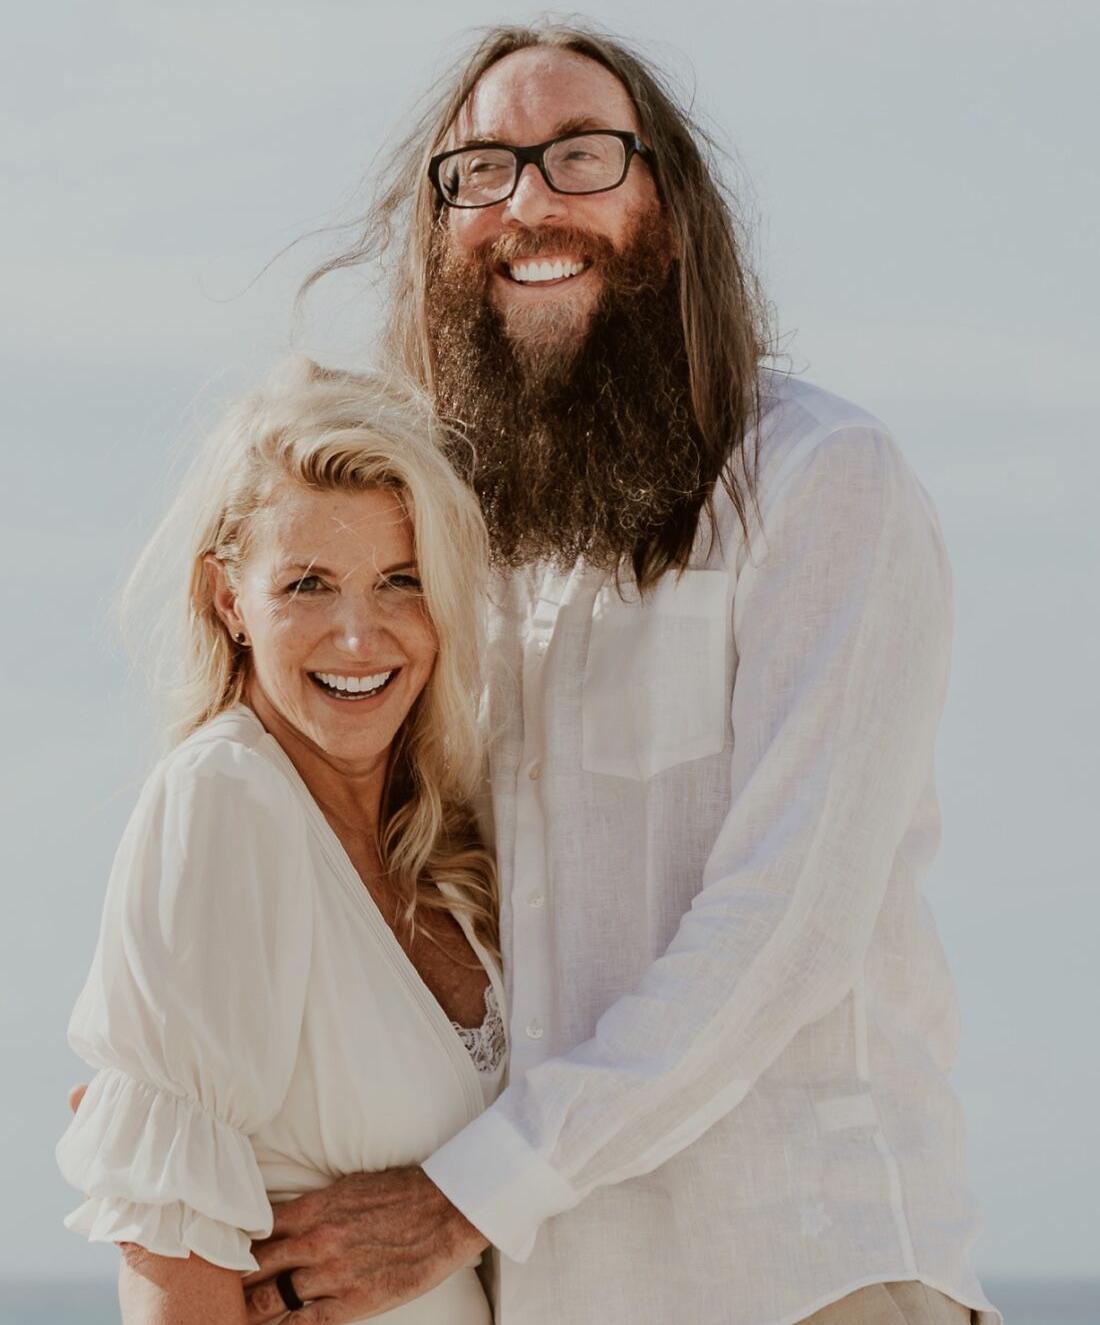 David Crowder mit lieber, Ehefrau Toni Crowder